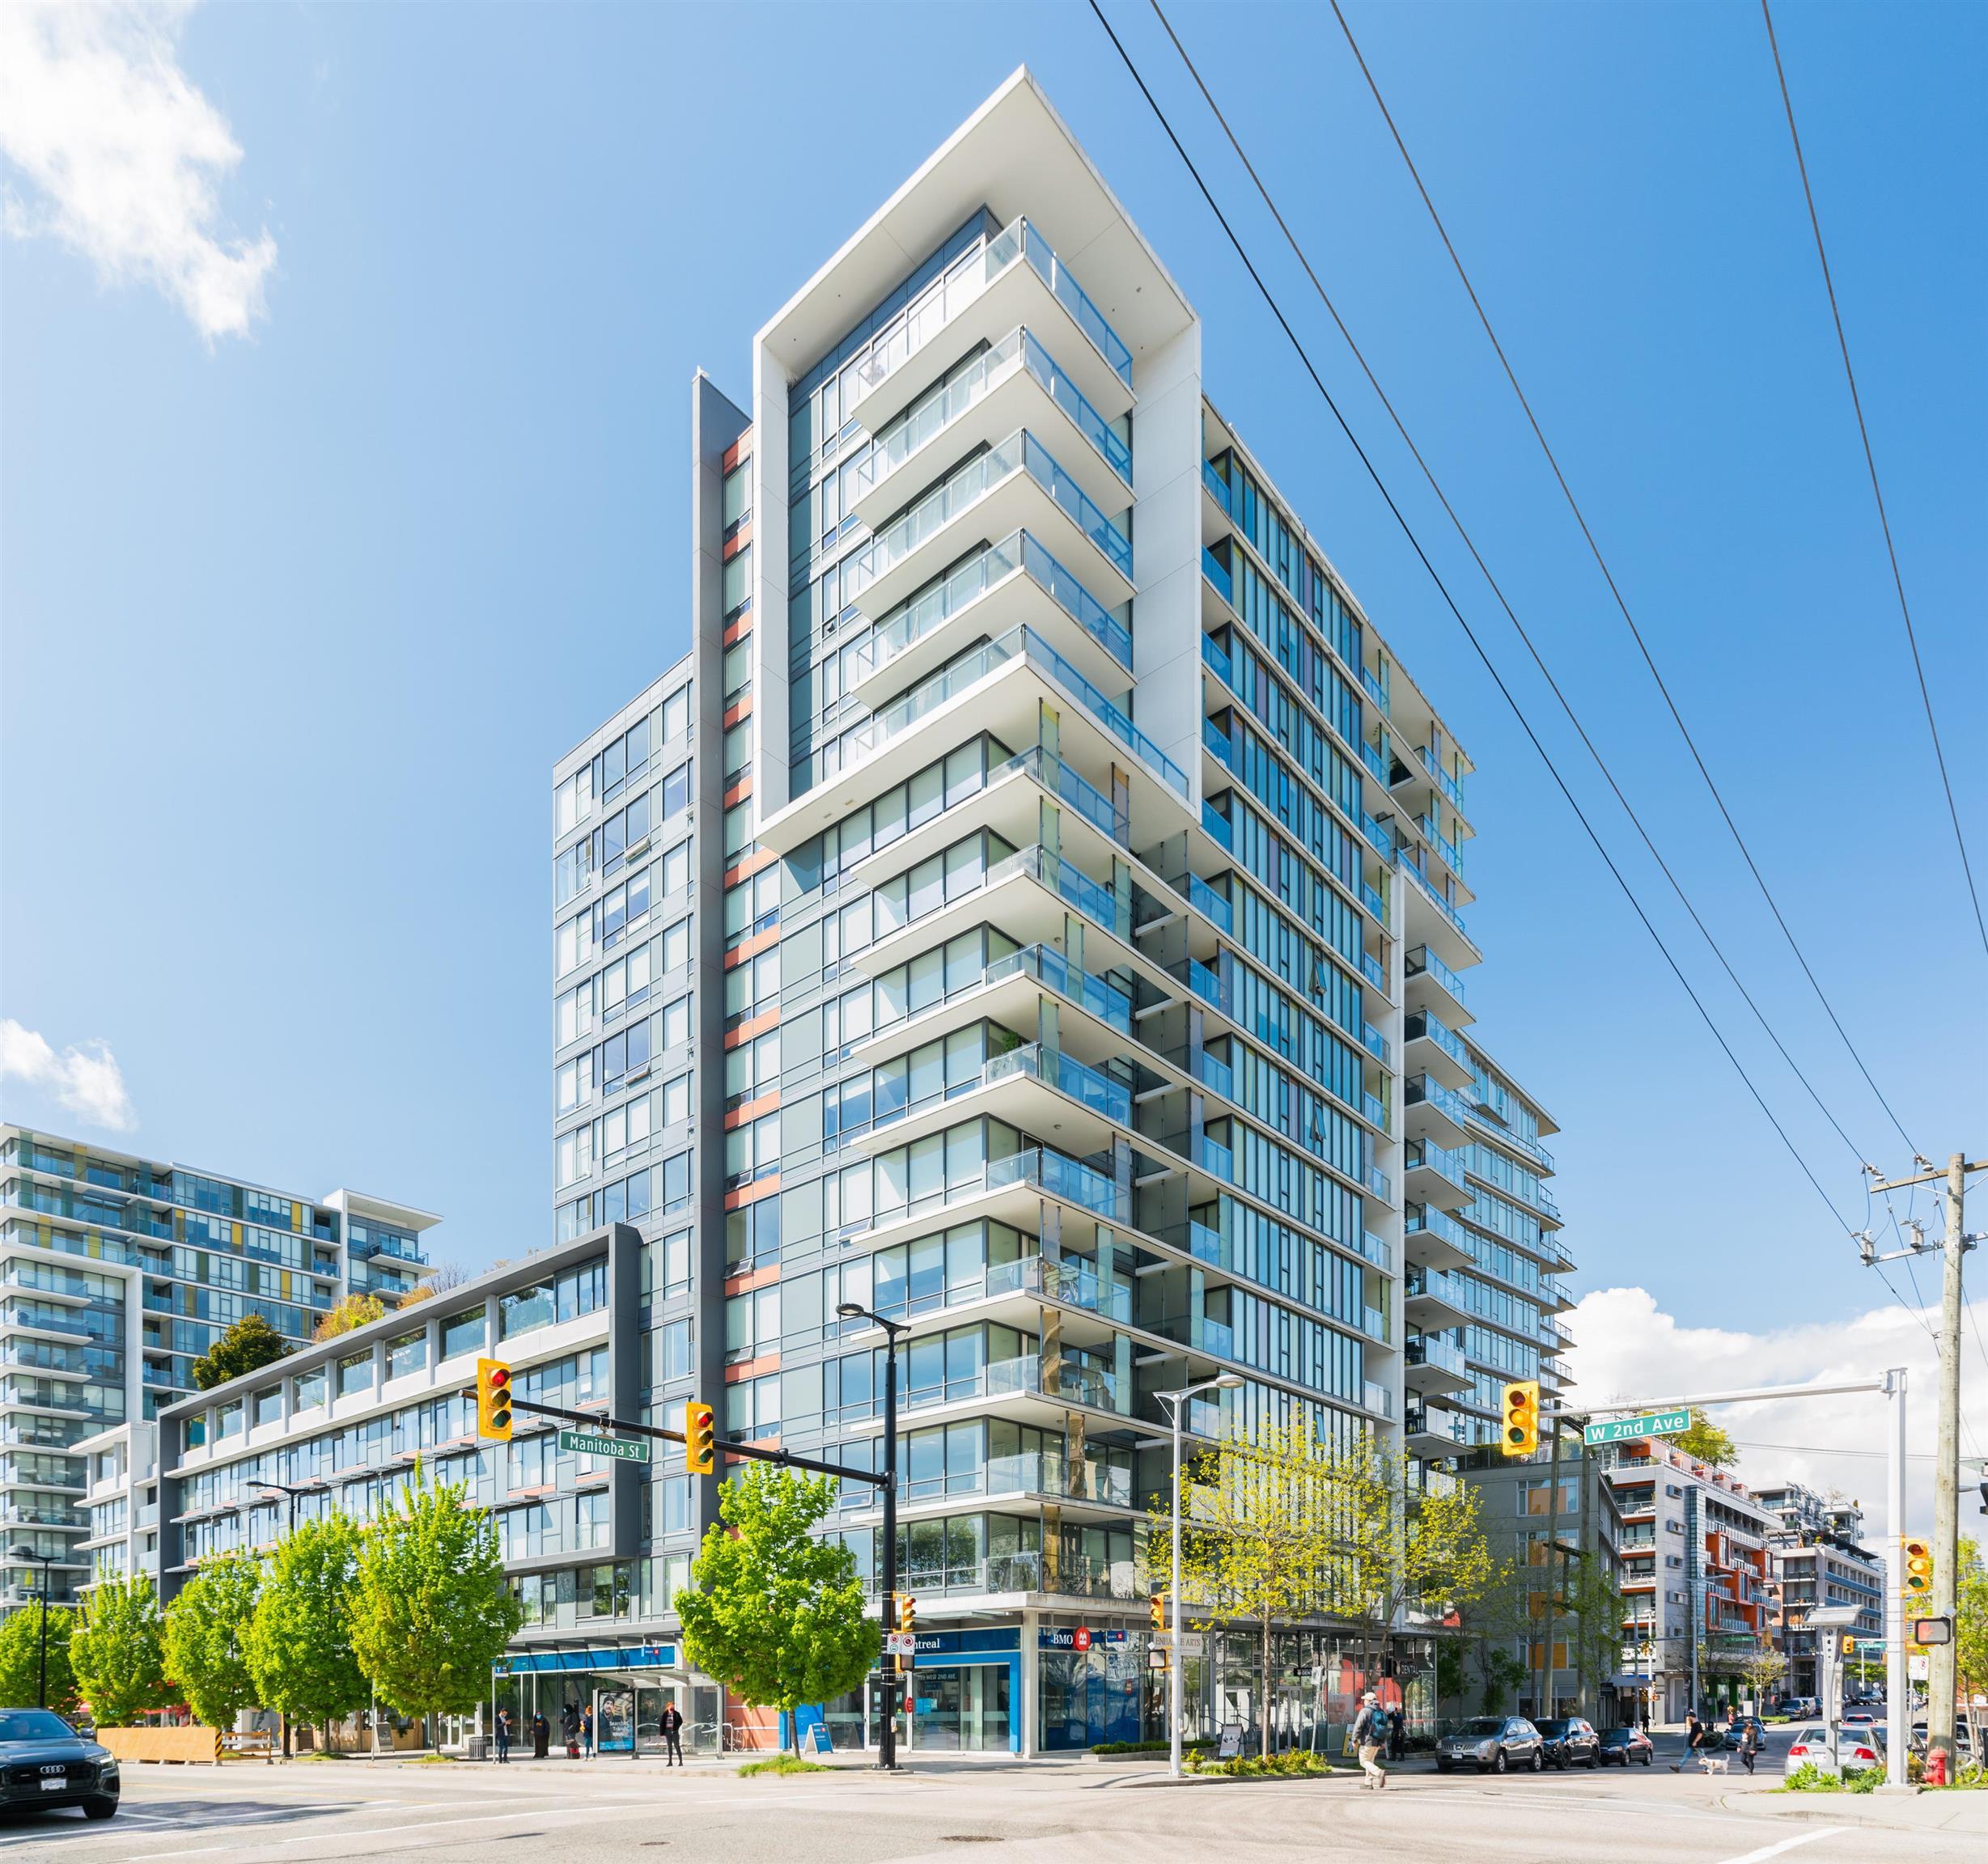 909 1783 MANITOBA STREET - False Creek Apartment/Condo for sale, 1 Bedroom (R2625180) - #1